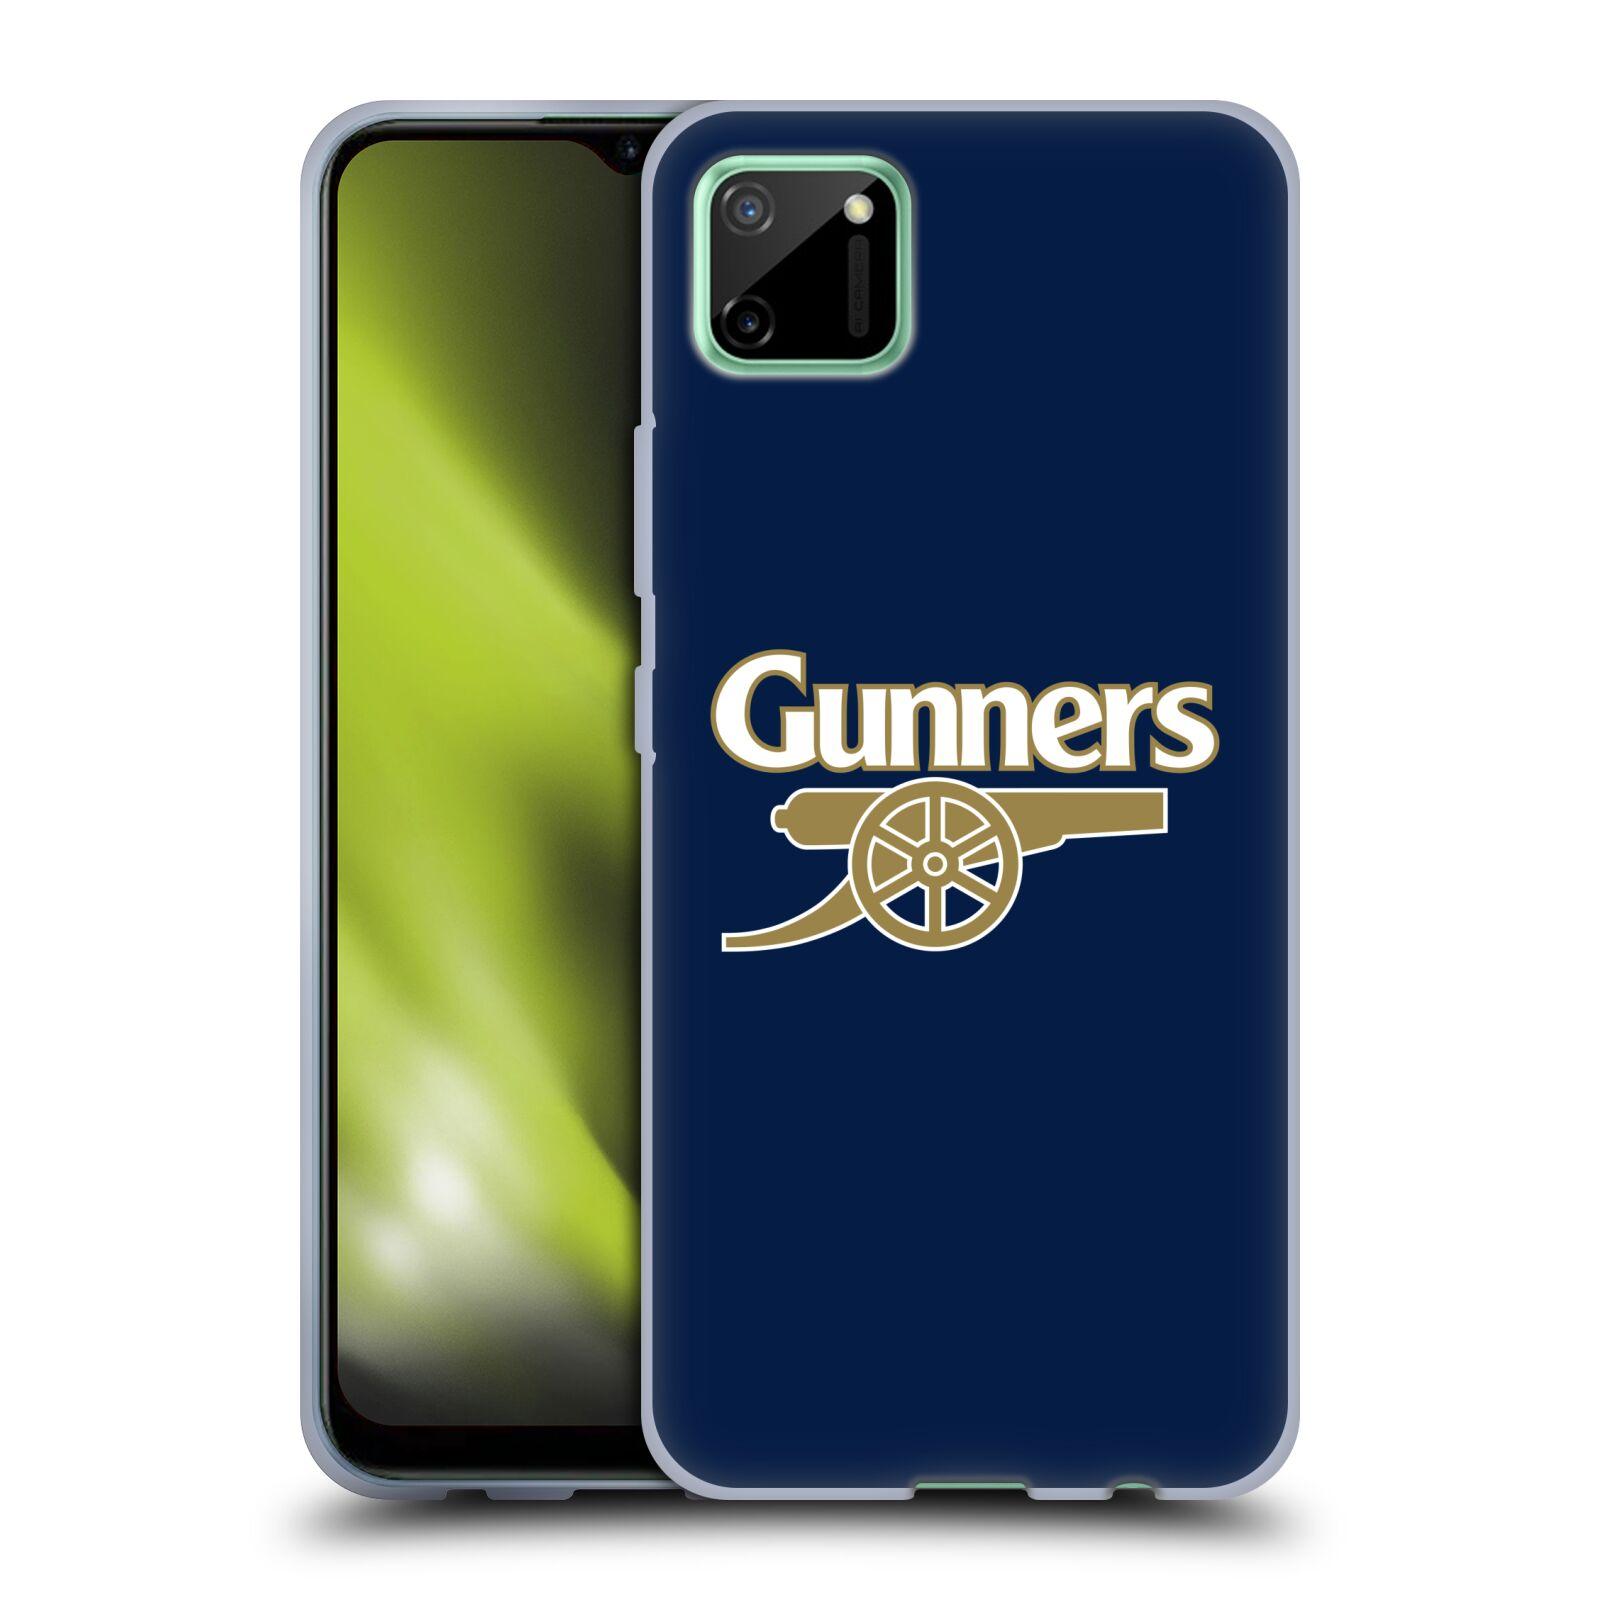 Silikonové pouzdro na mobil Realme C11 - Head Case - Arsenal FC - Gunners